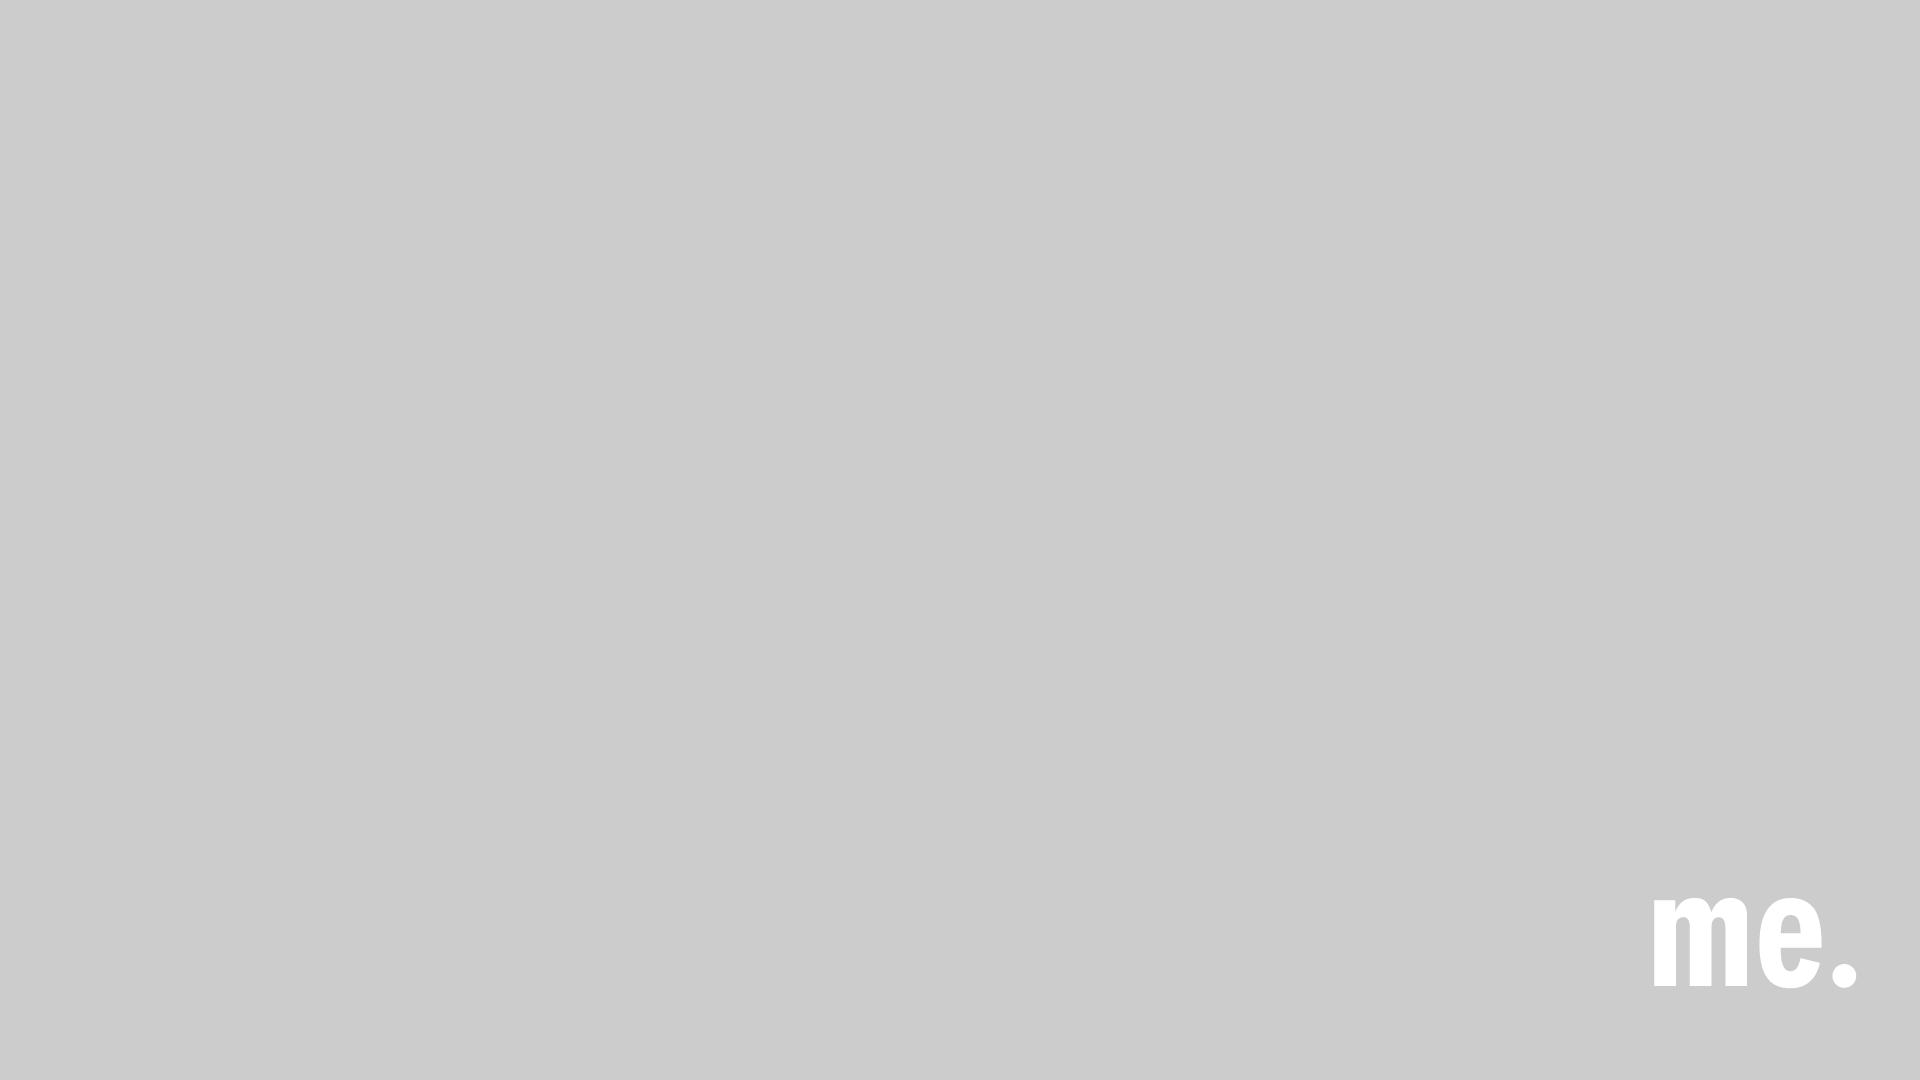 Wie lebendig: Tupac Shakur als Wachsfigur bei Madame Tussauds in London, Januar 2013